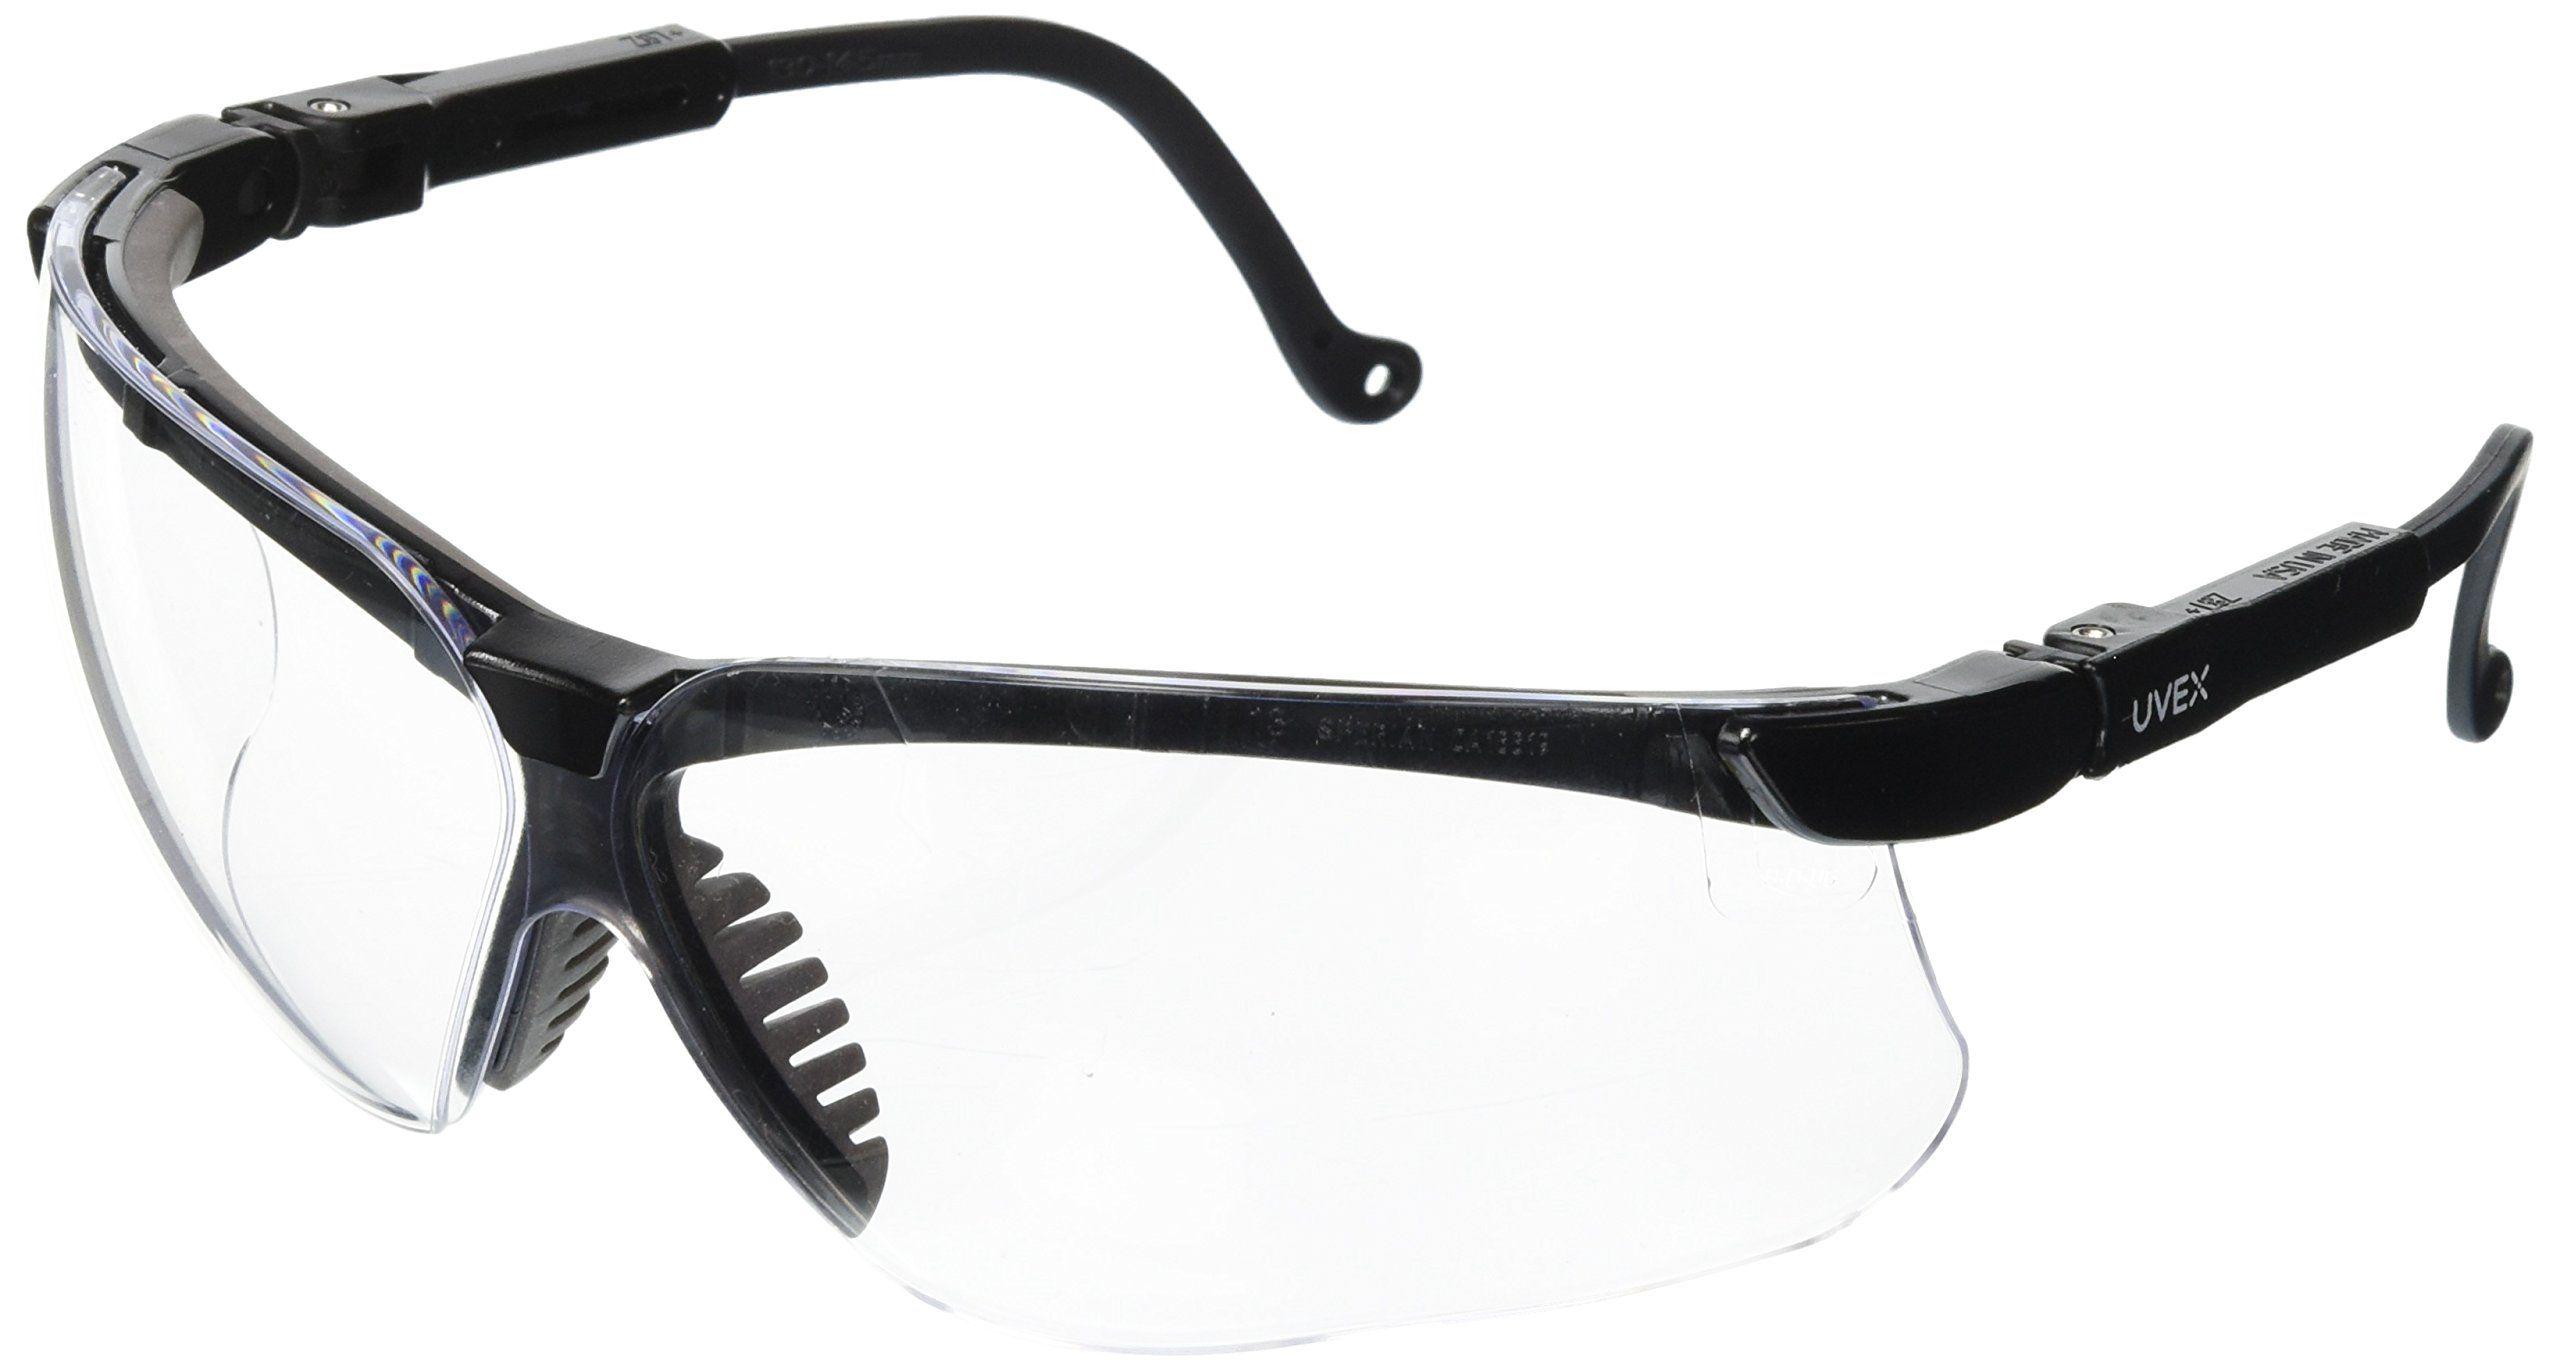 Uvex S3200 Genesis Safety Eyewear Black Frame Clear